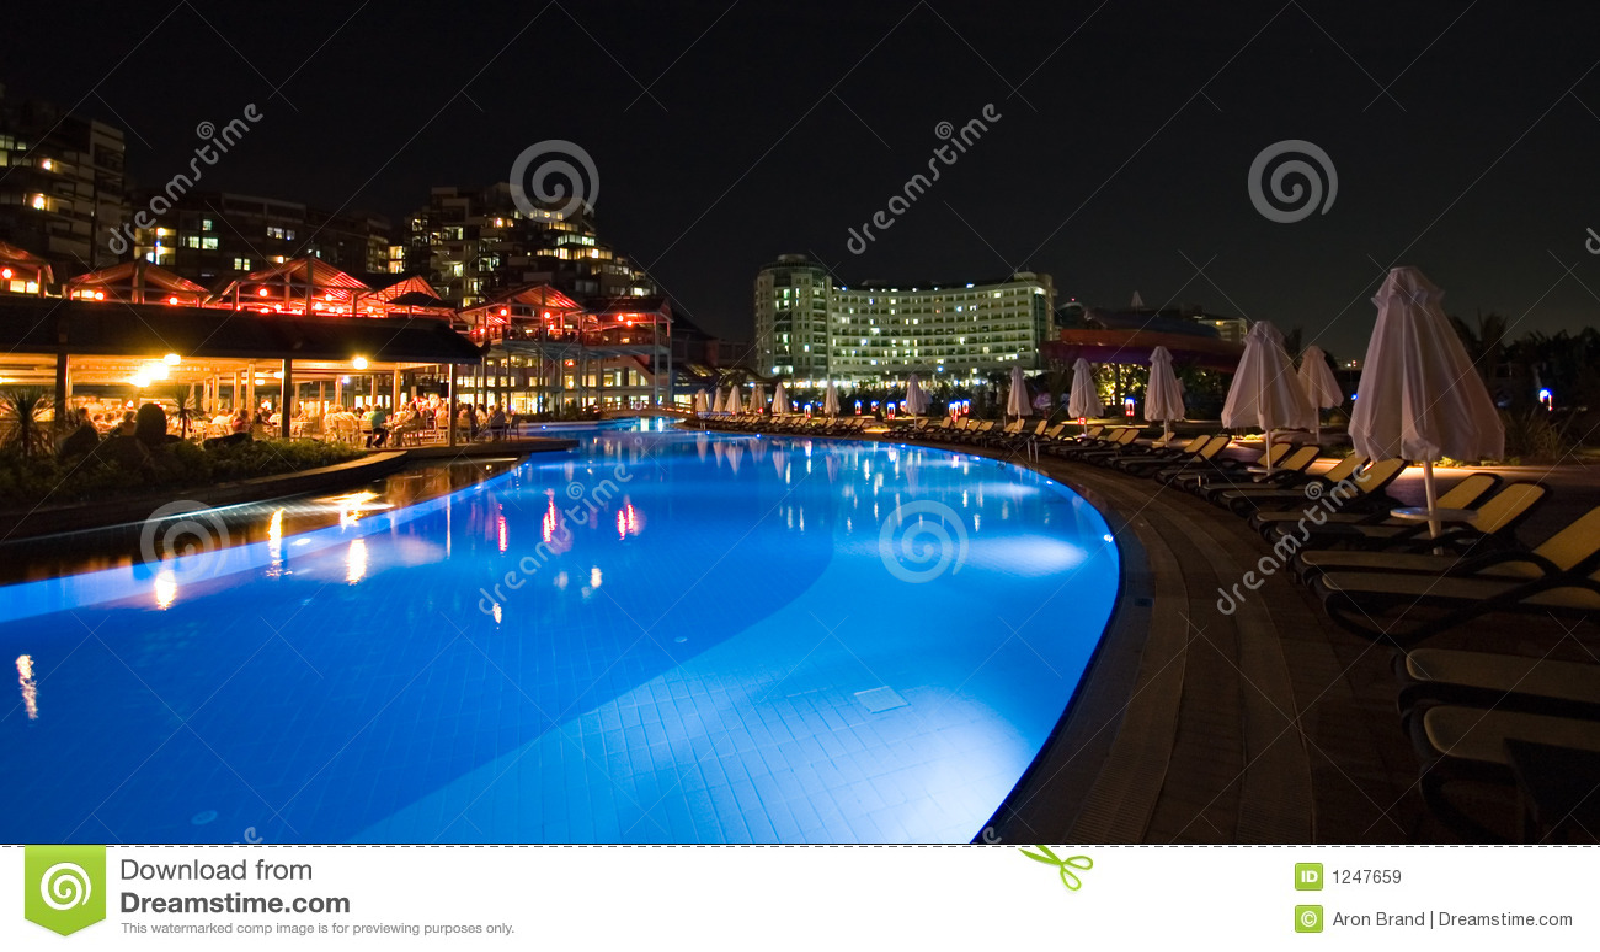 Luxury hotel swimming pool